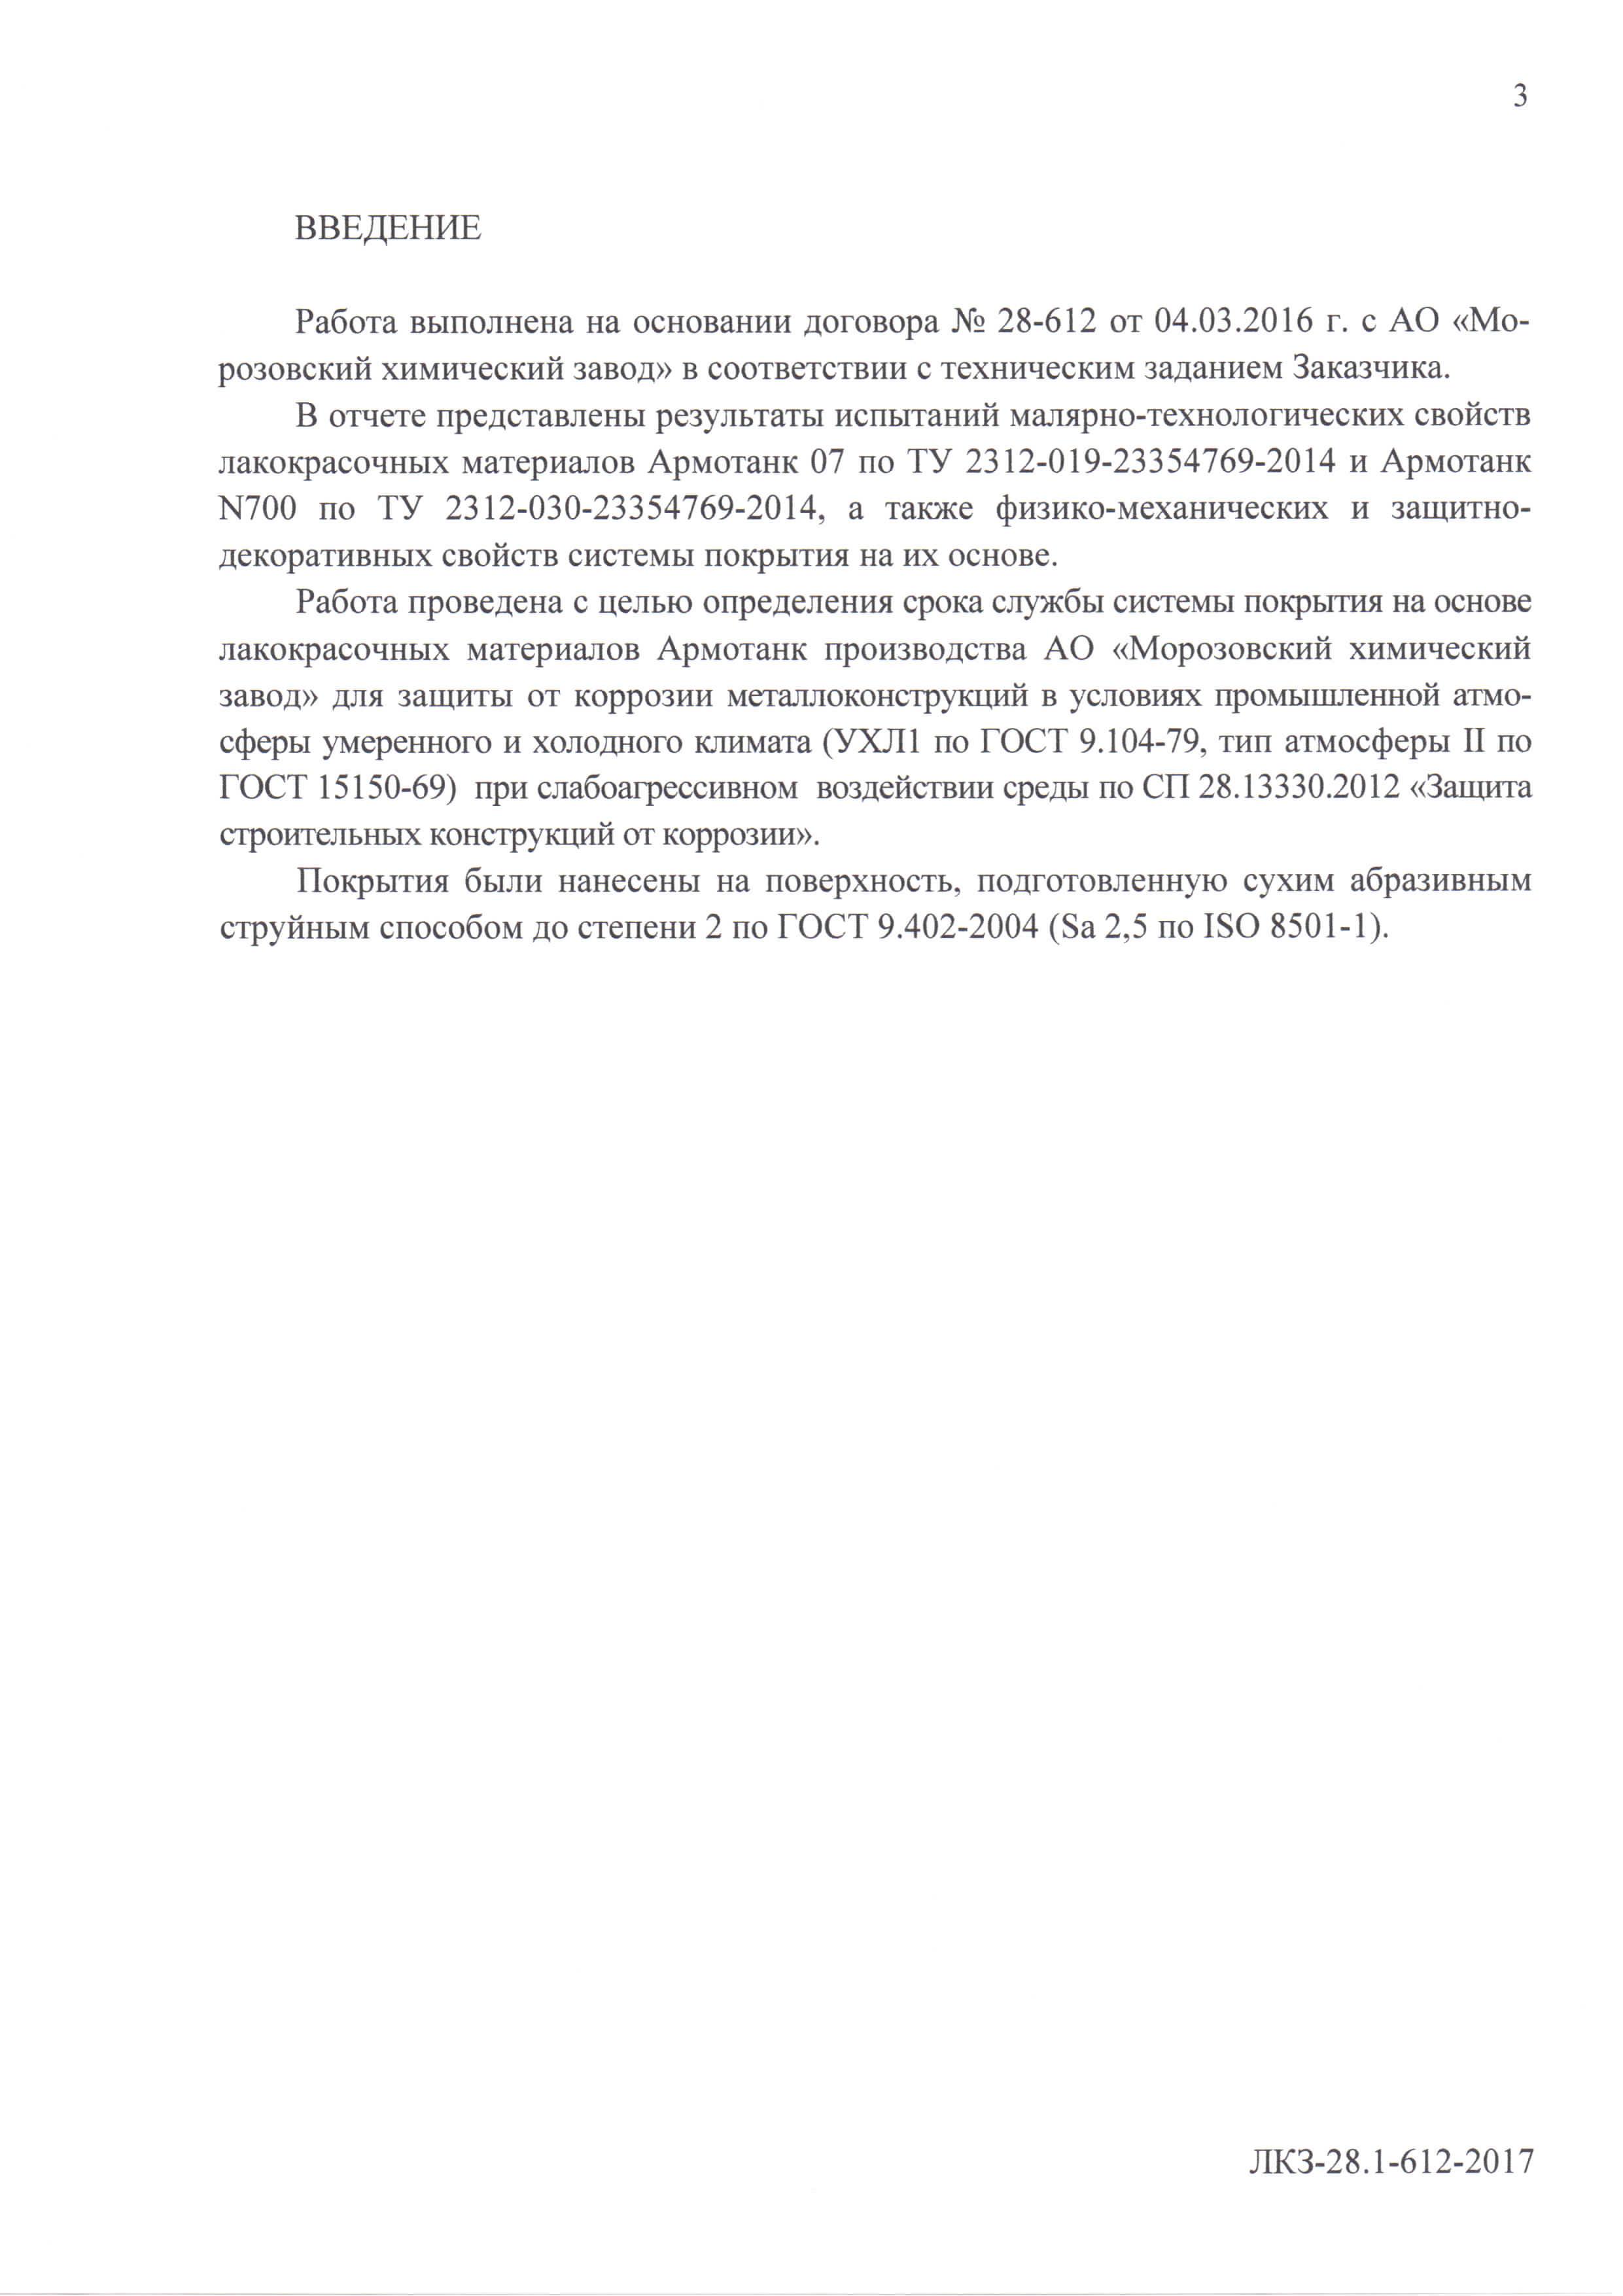 ЦНИИПСК им.Мельникова Армотанк 07+N700, 25 лет УХЛ1_Страница_03